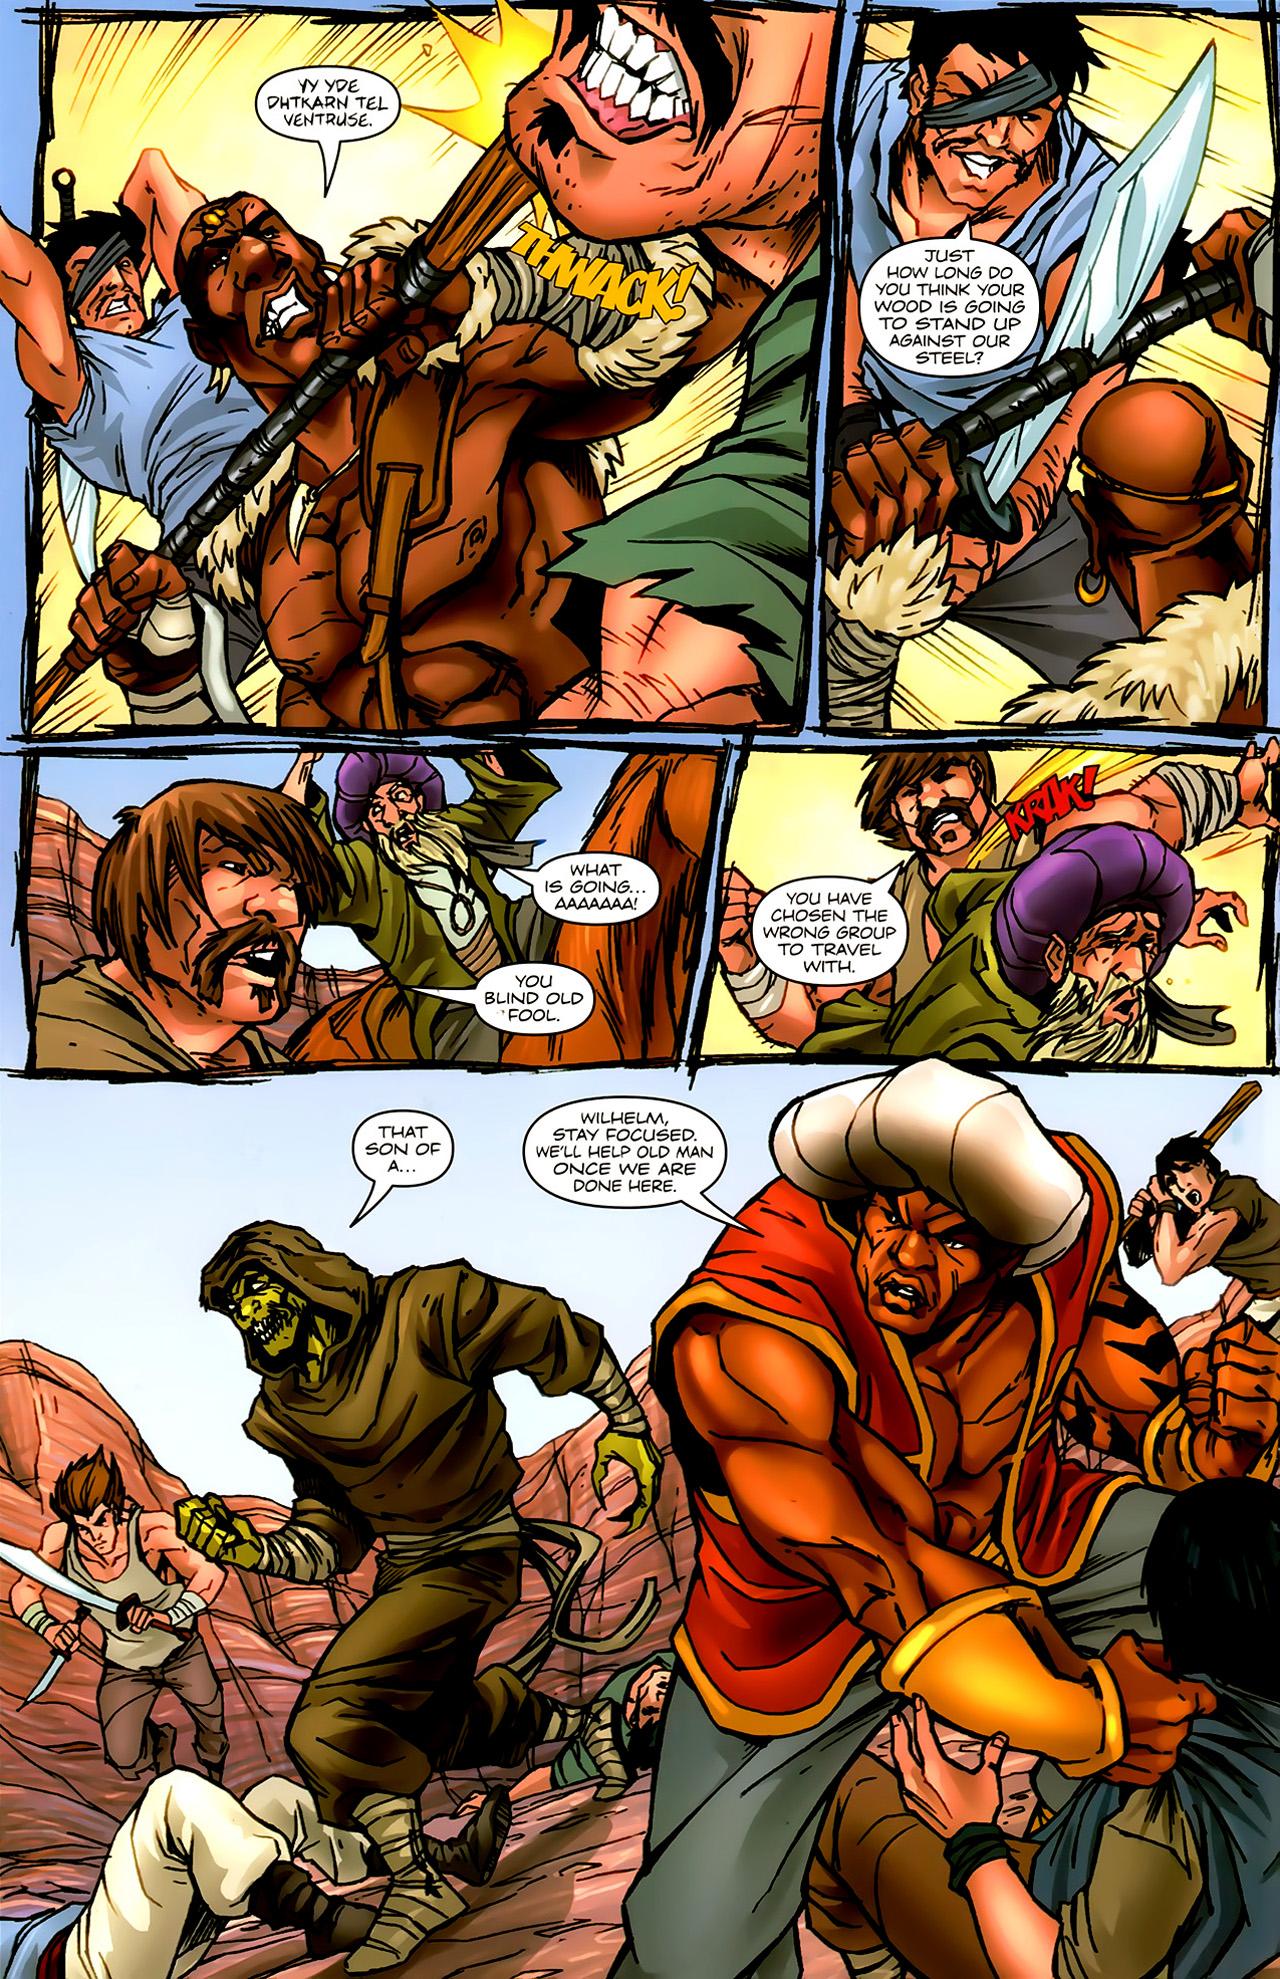 Read online 1001 Arabian Nights: The Adventures of Sinbad comic -  Issue #9 - 16